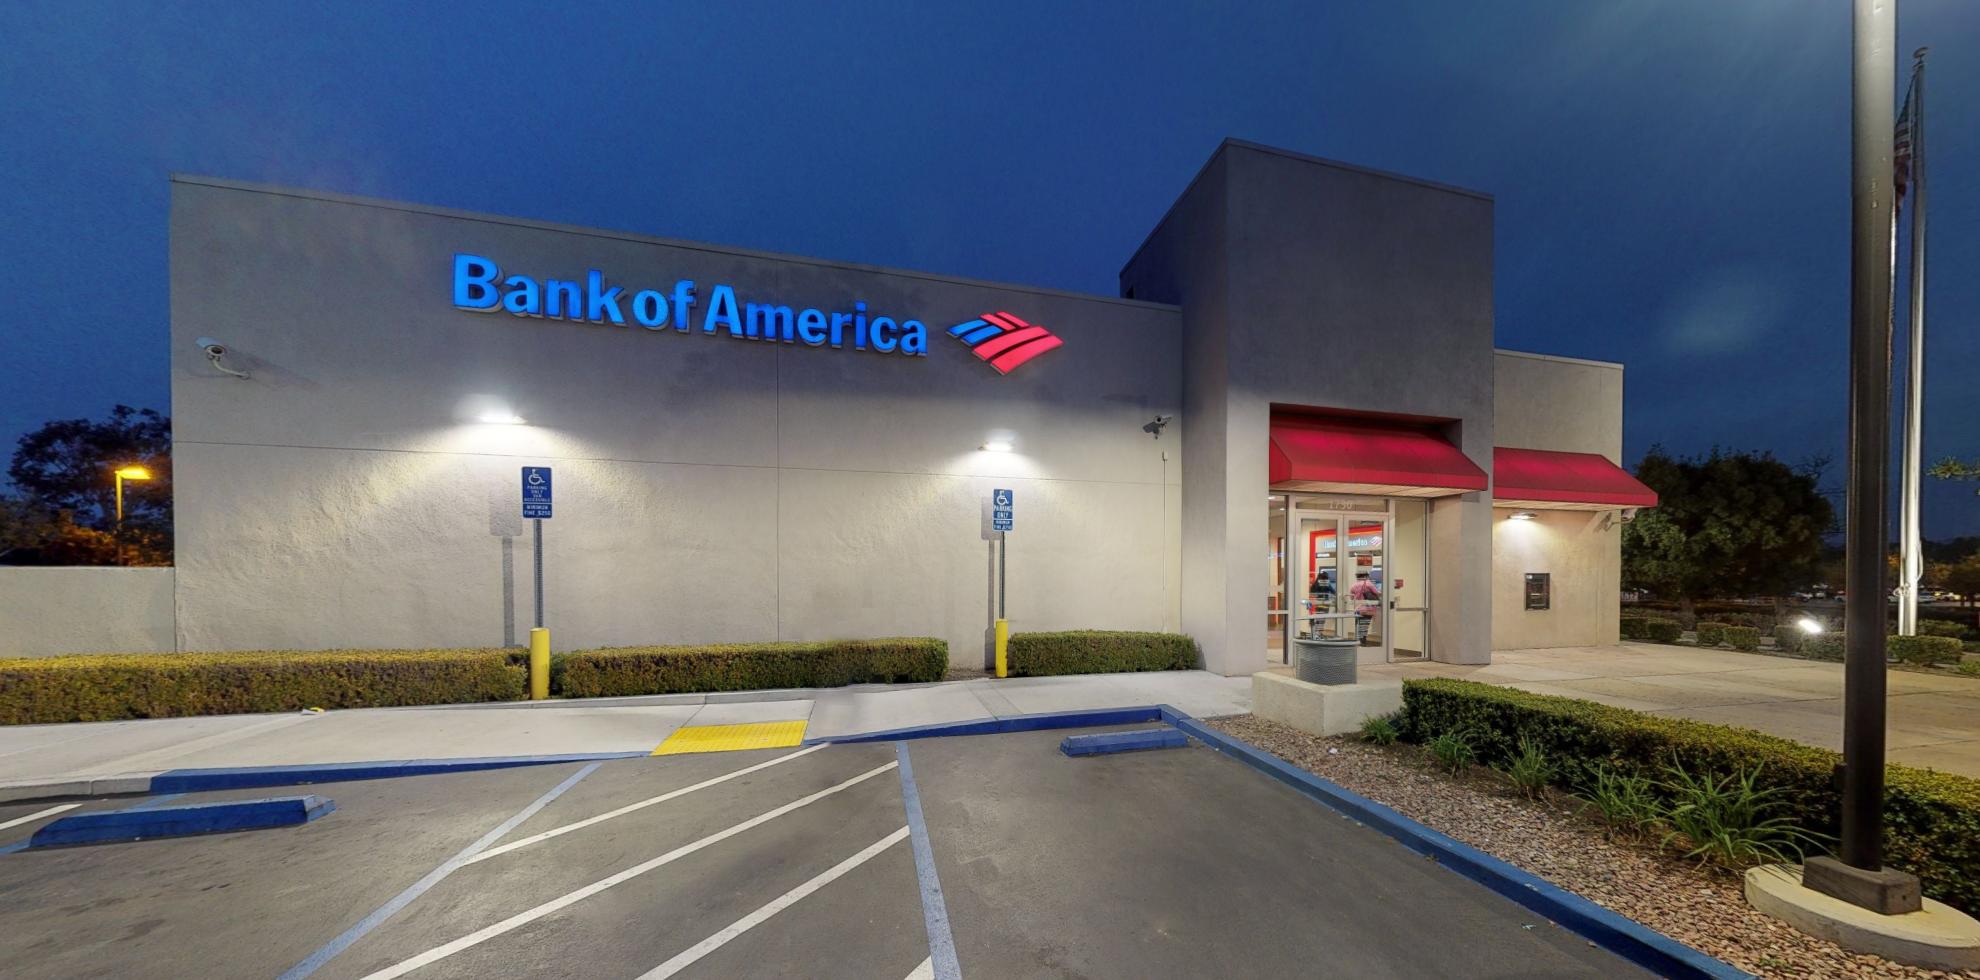 Bank of America financial center with drive-thru ATM   1730 University Dr, Vista, CA 92083